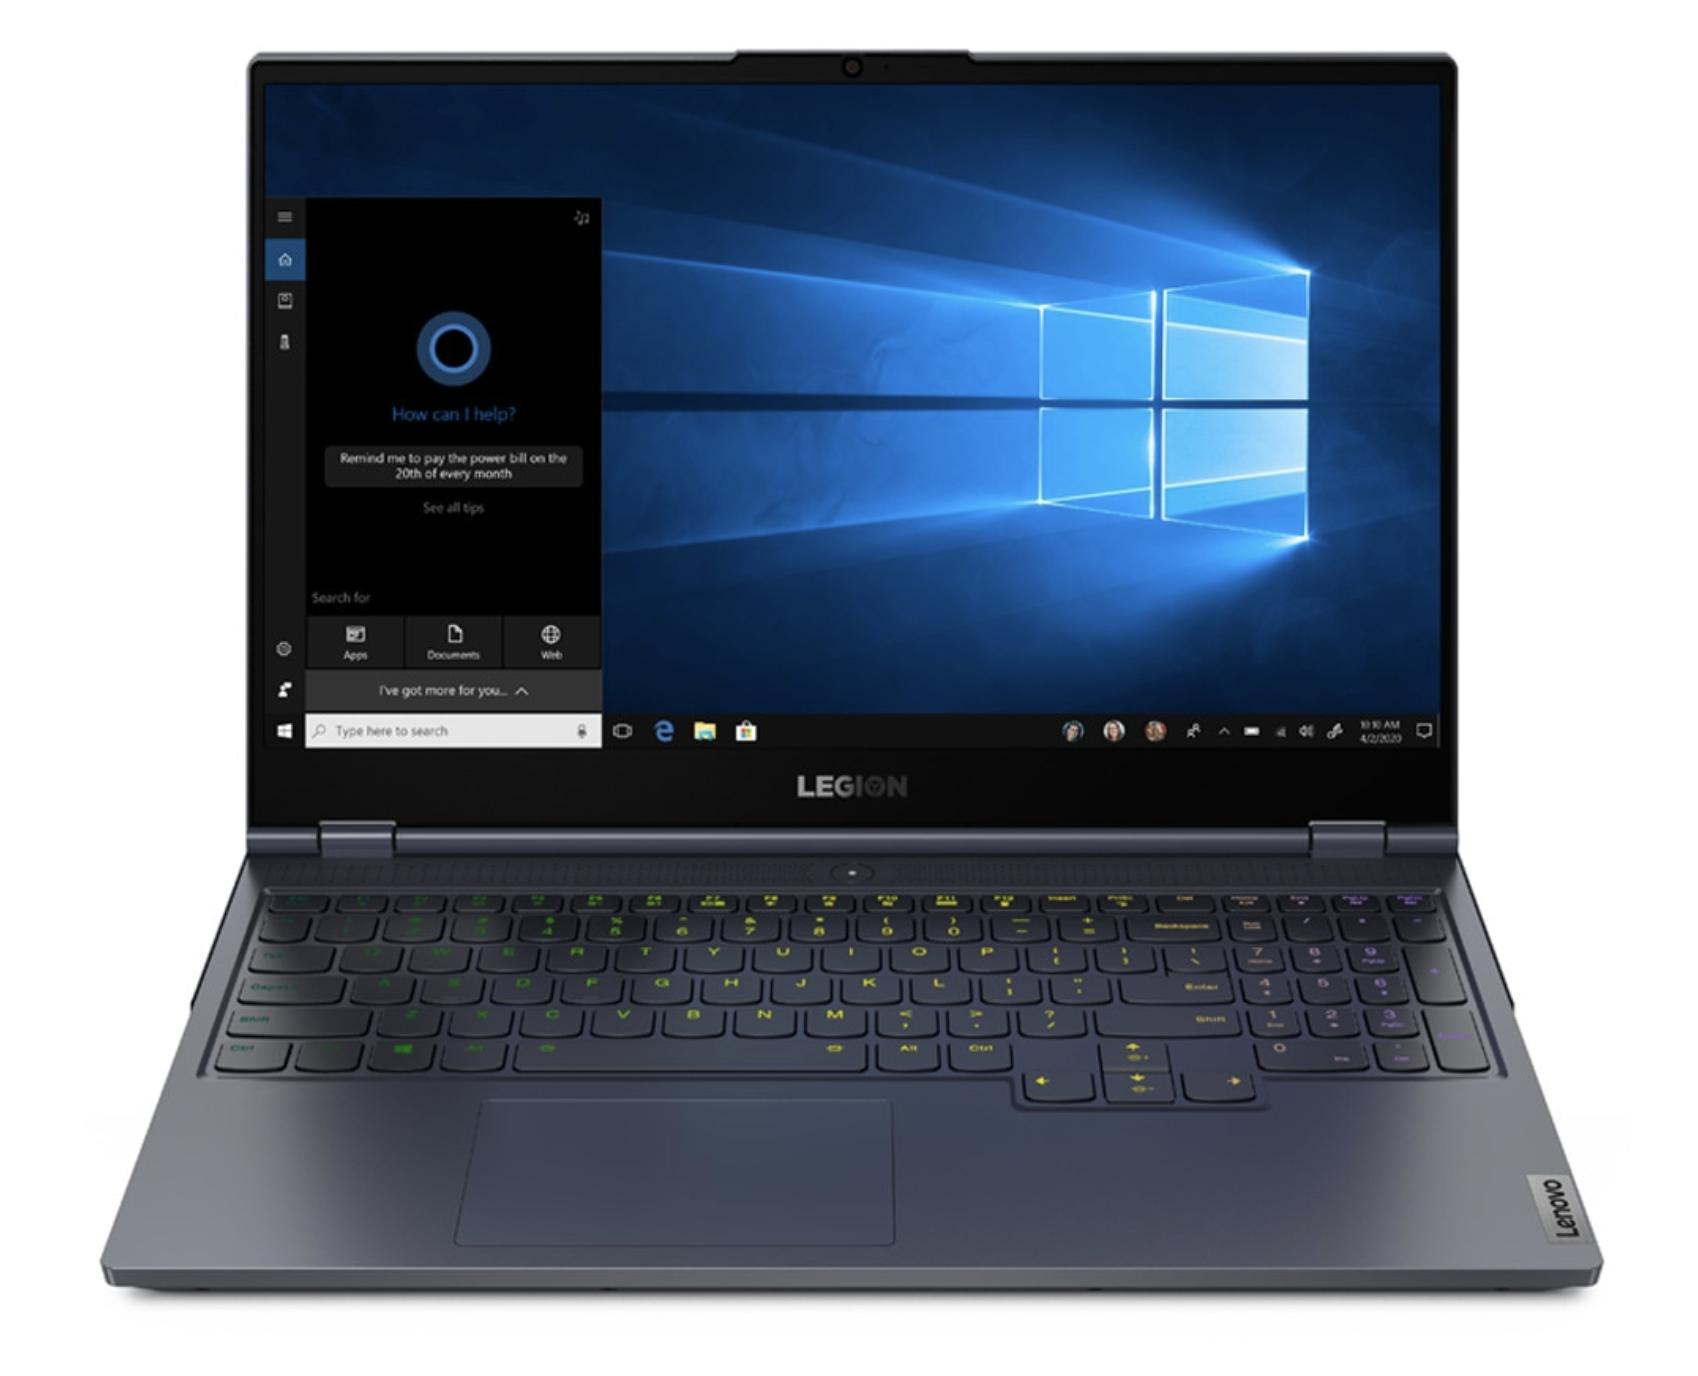 Portátil Gaming Lenovo Legion 7i 15IMH05-5QSP, i7, 16GB, 512GB SSD, GeForce RTX 2080 Super Max-Q 8GB, FreeDOS / Sin Sistema Operativo